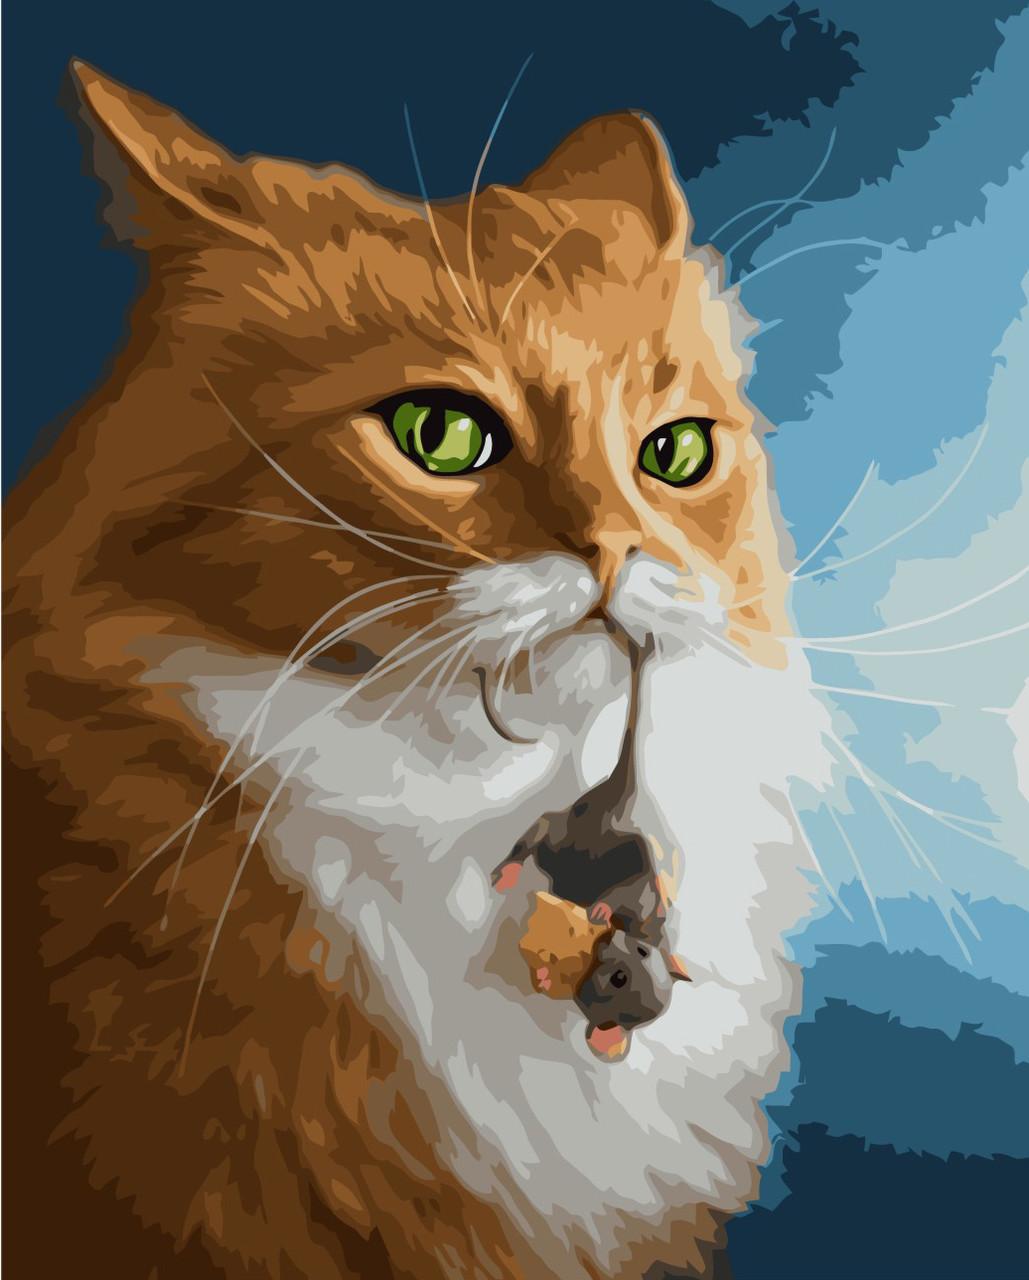 Картина по номерам VA-2032 Кот и мыша, 40х50см. Strateg